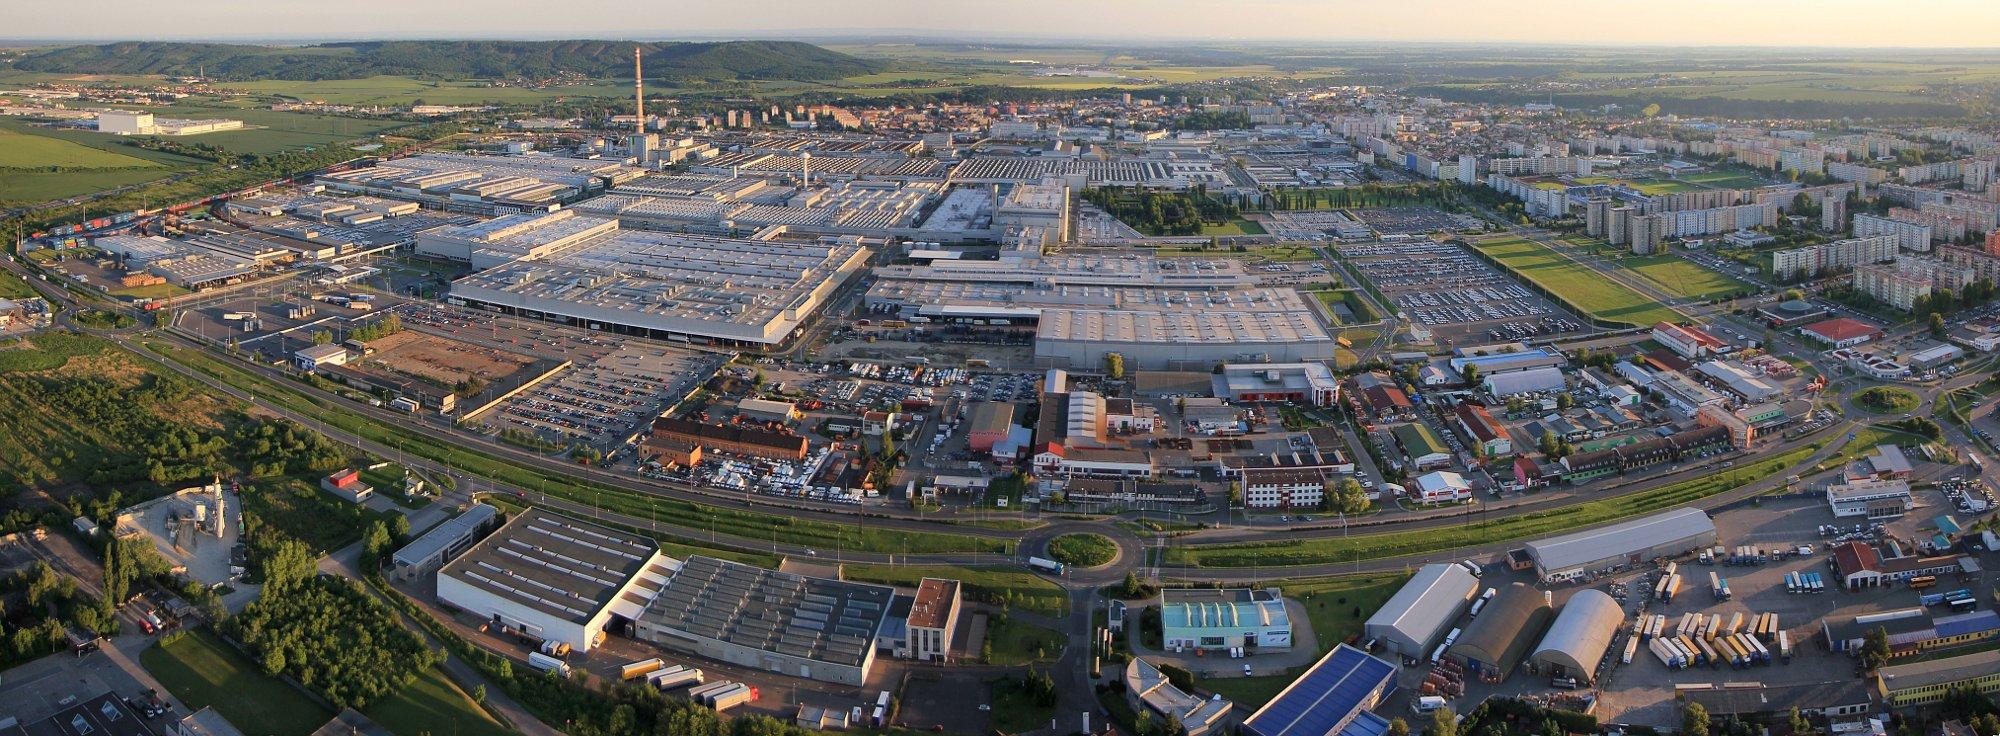 Radio Prague Mlad 225 Boleslav An Industrial Town With An